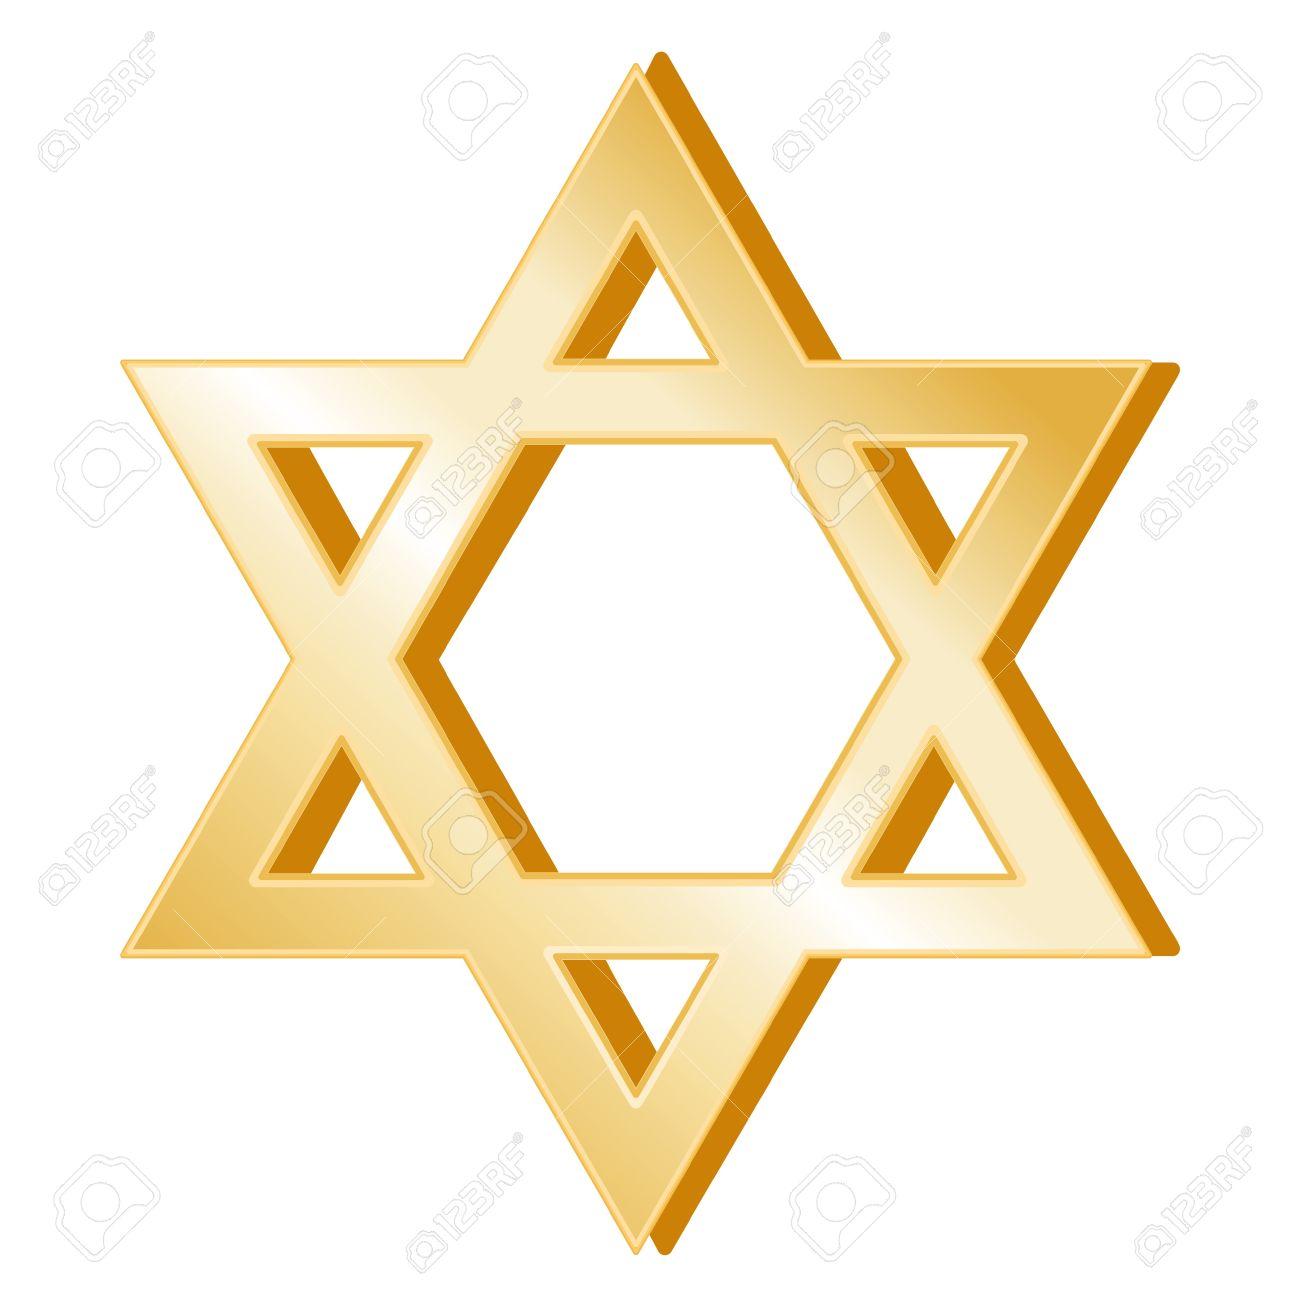 Judaism Symbol. Golden Star of David, symbol of the Jewish faith, white background. Stock Vector - 12392253